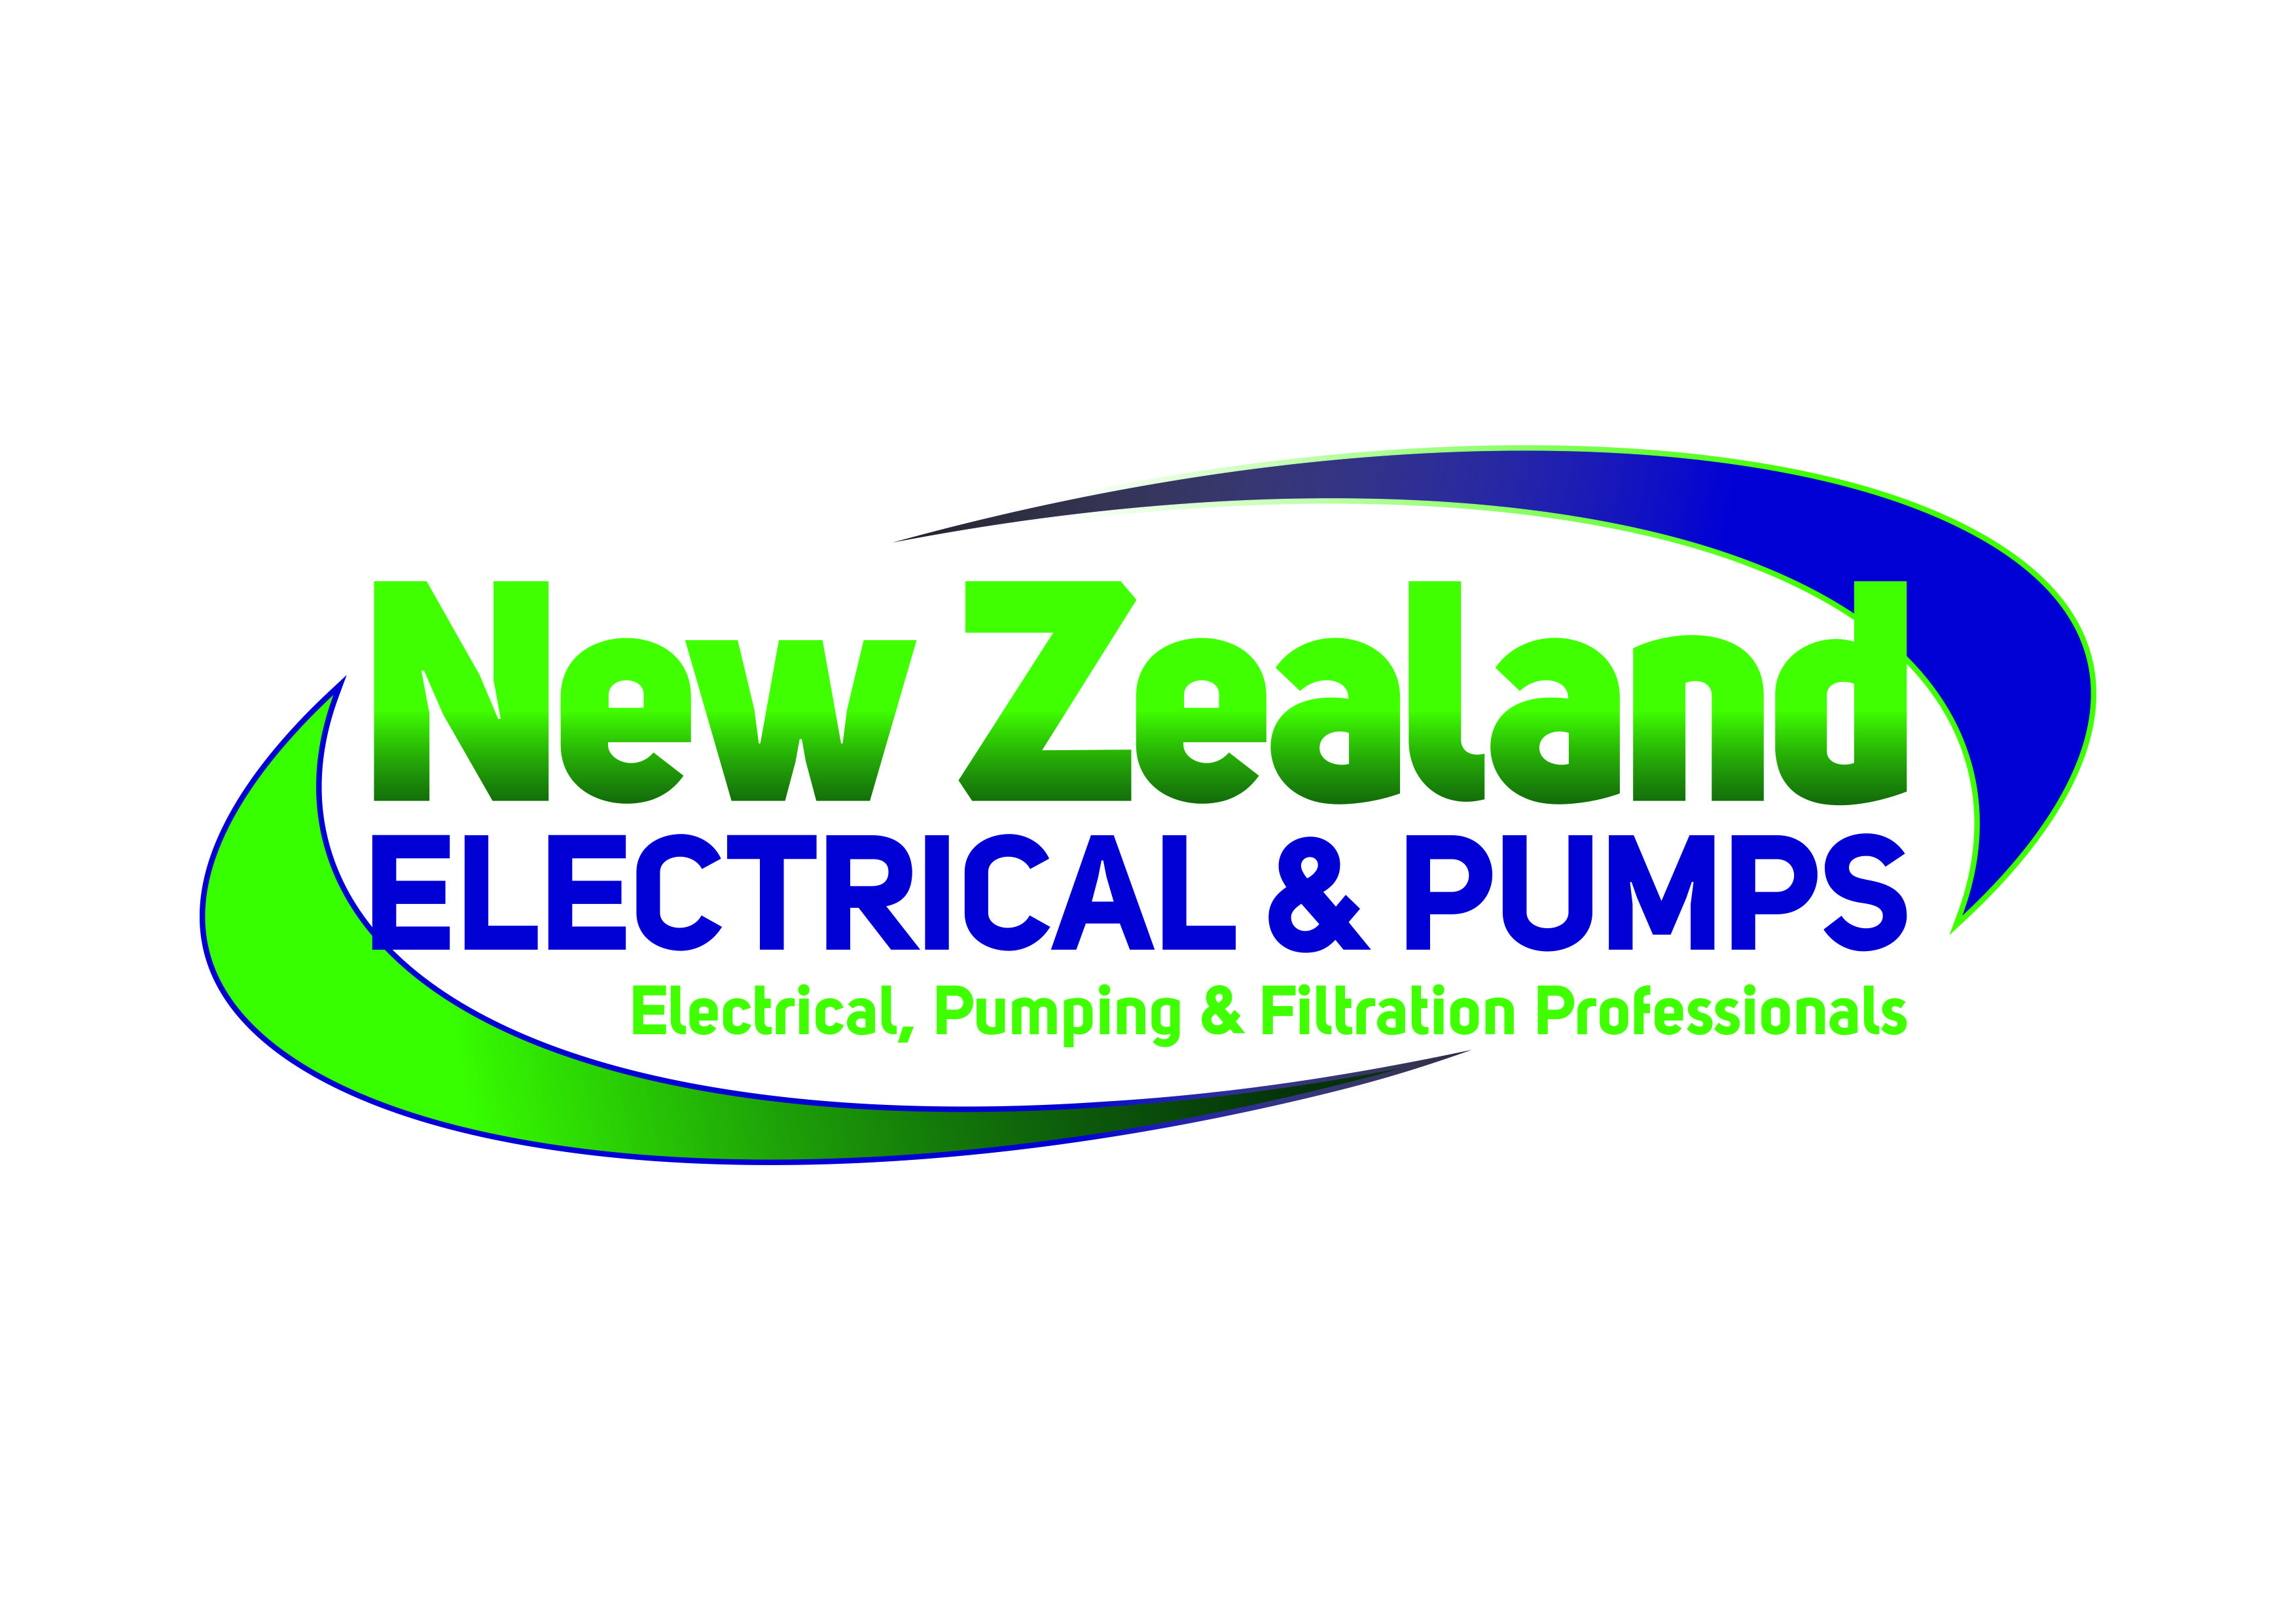 New Zealand Electrical & Pumps Ltd